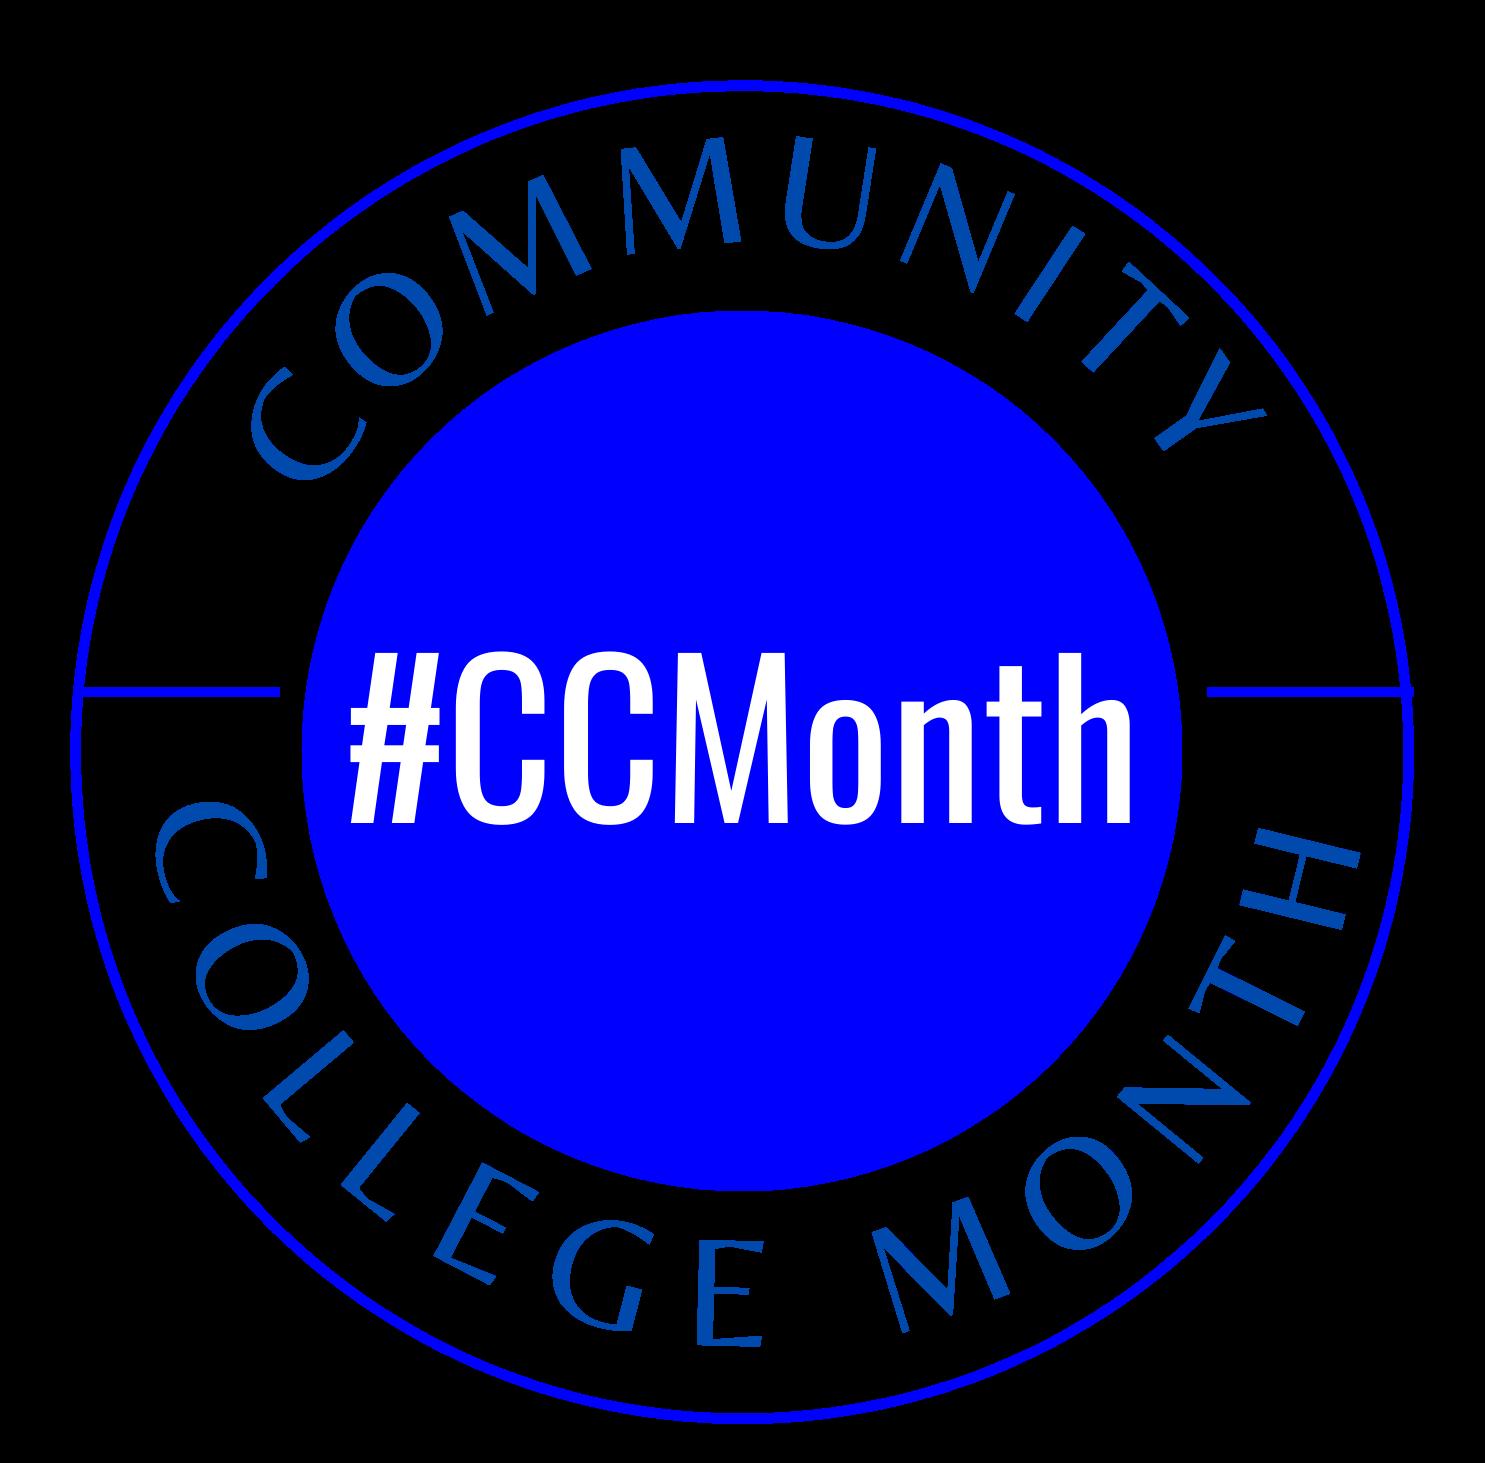 Community College Month logo